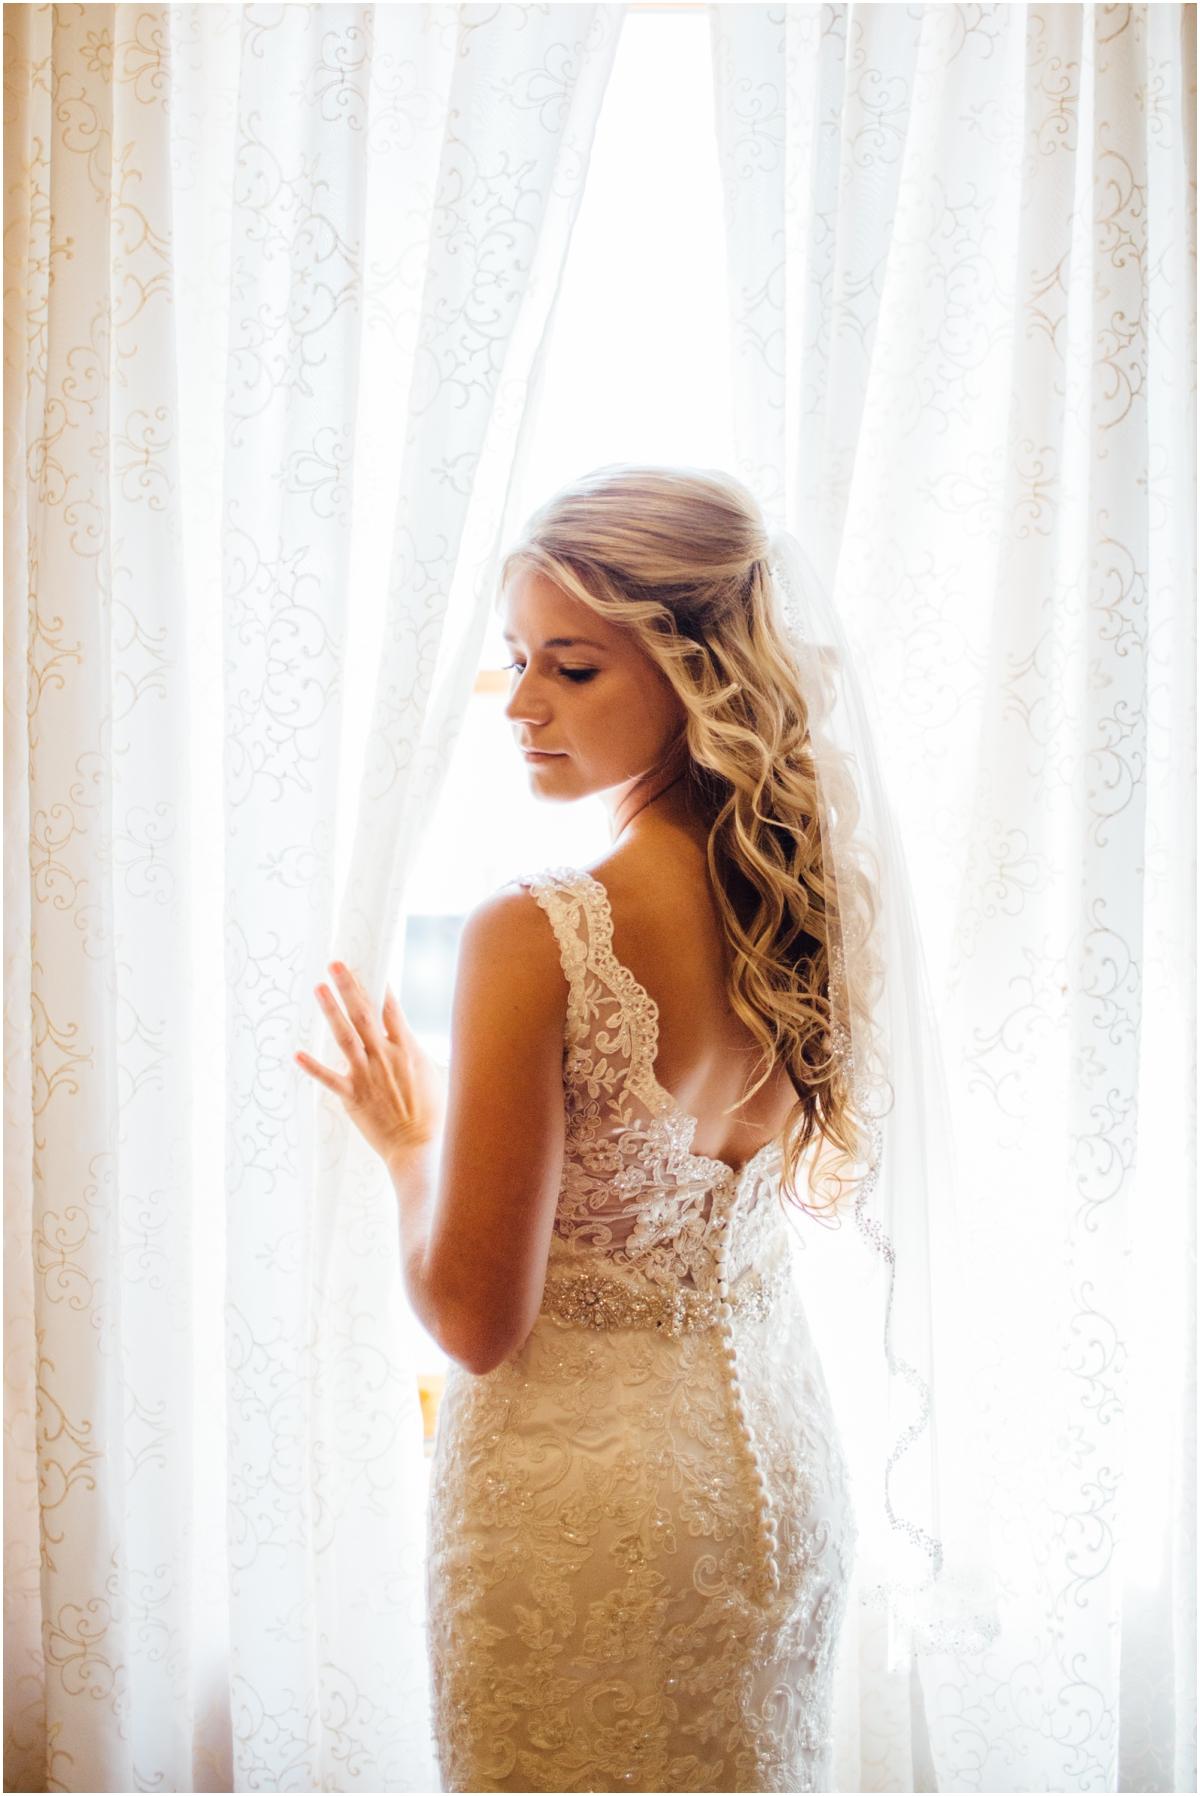 katy-sergent-photography-tennessee-wedding-engagement-johnson-city-lodges-at-gettysburg-rustic_0038.jpg